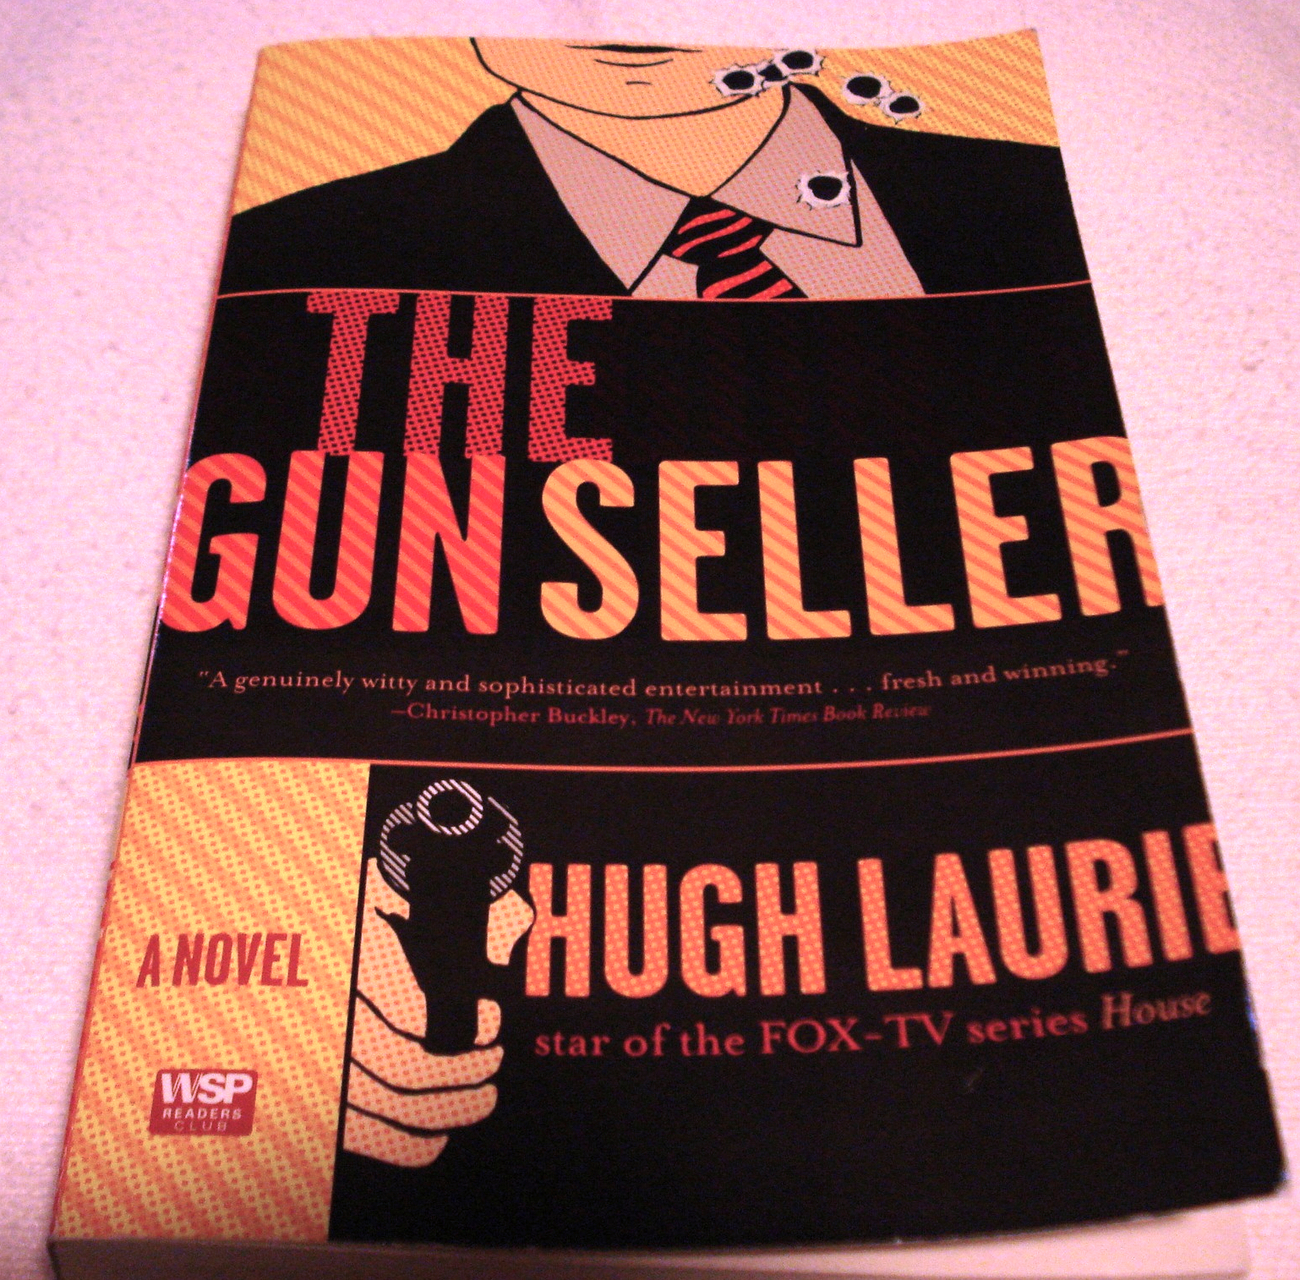 1the gun seller